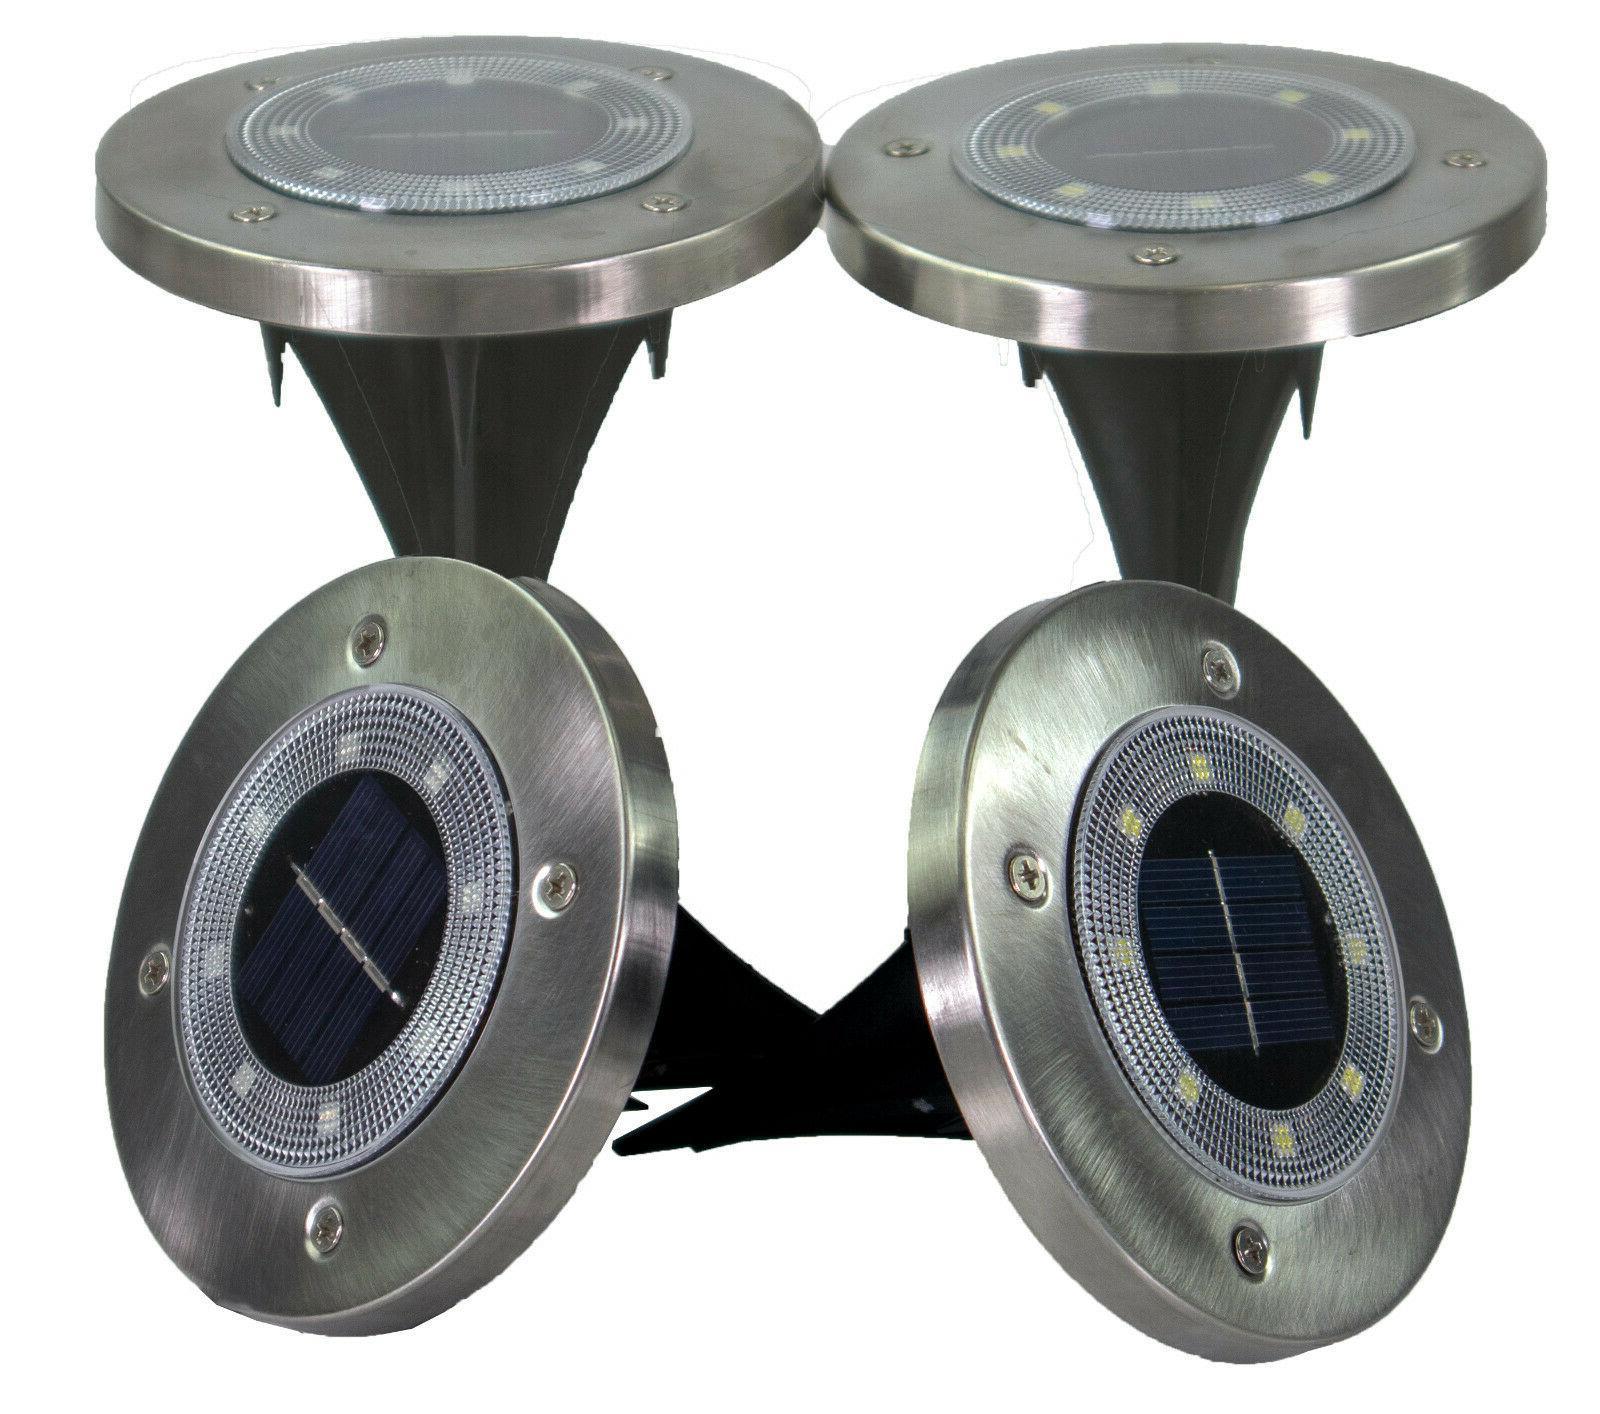 4 LED Lights Diffusure Lens Waterproof